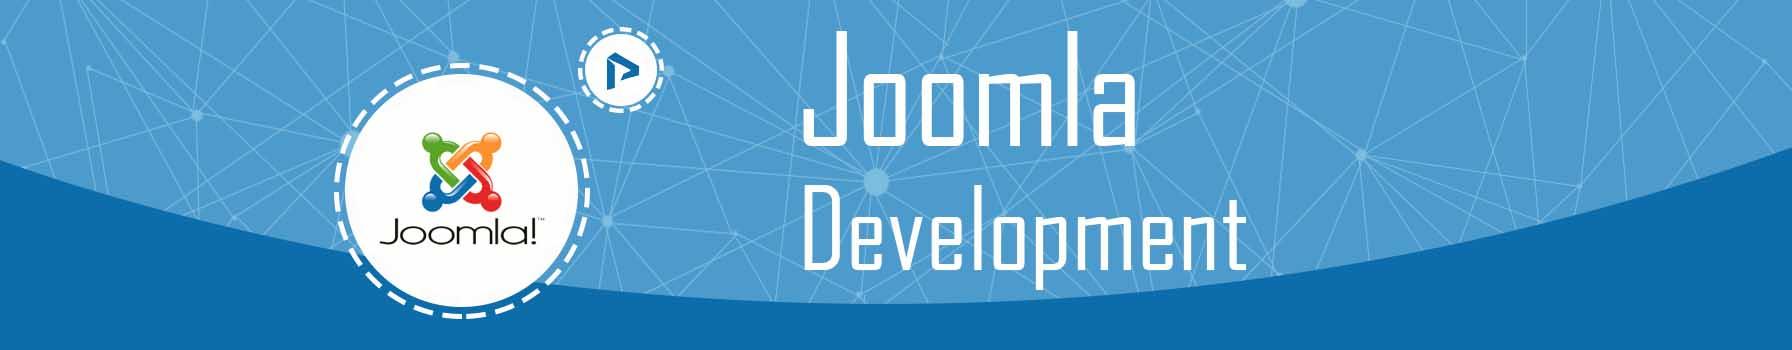 joomla-development.jpg